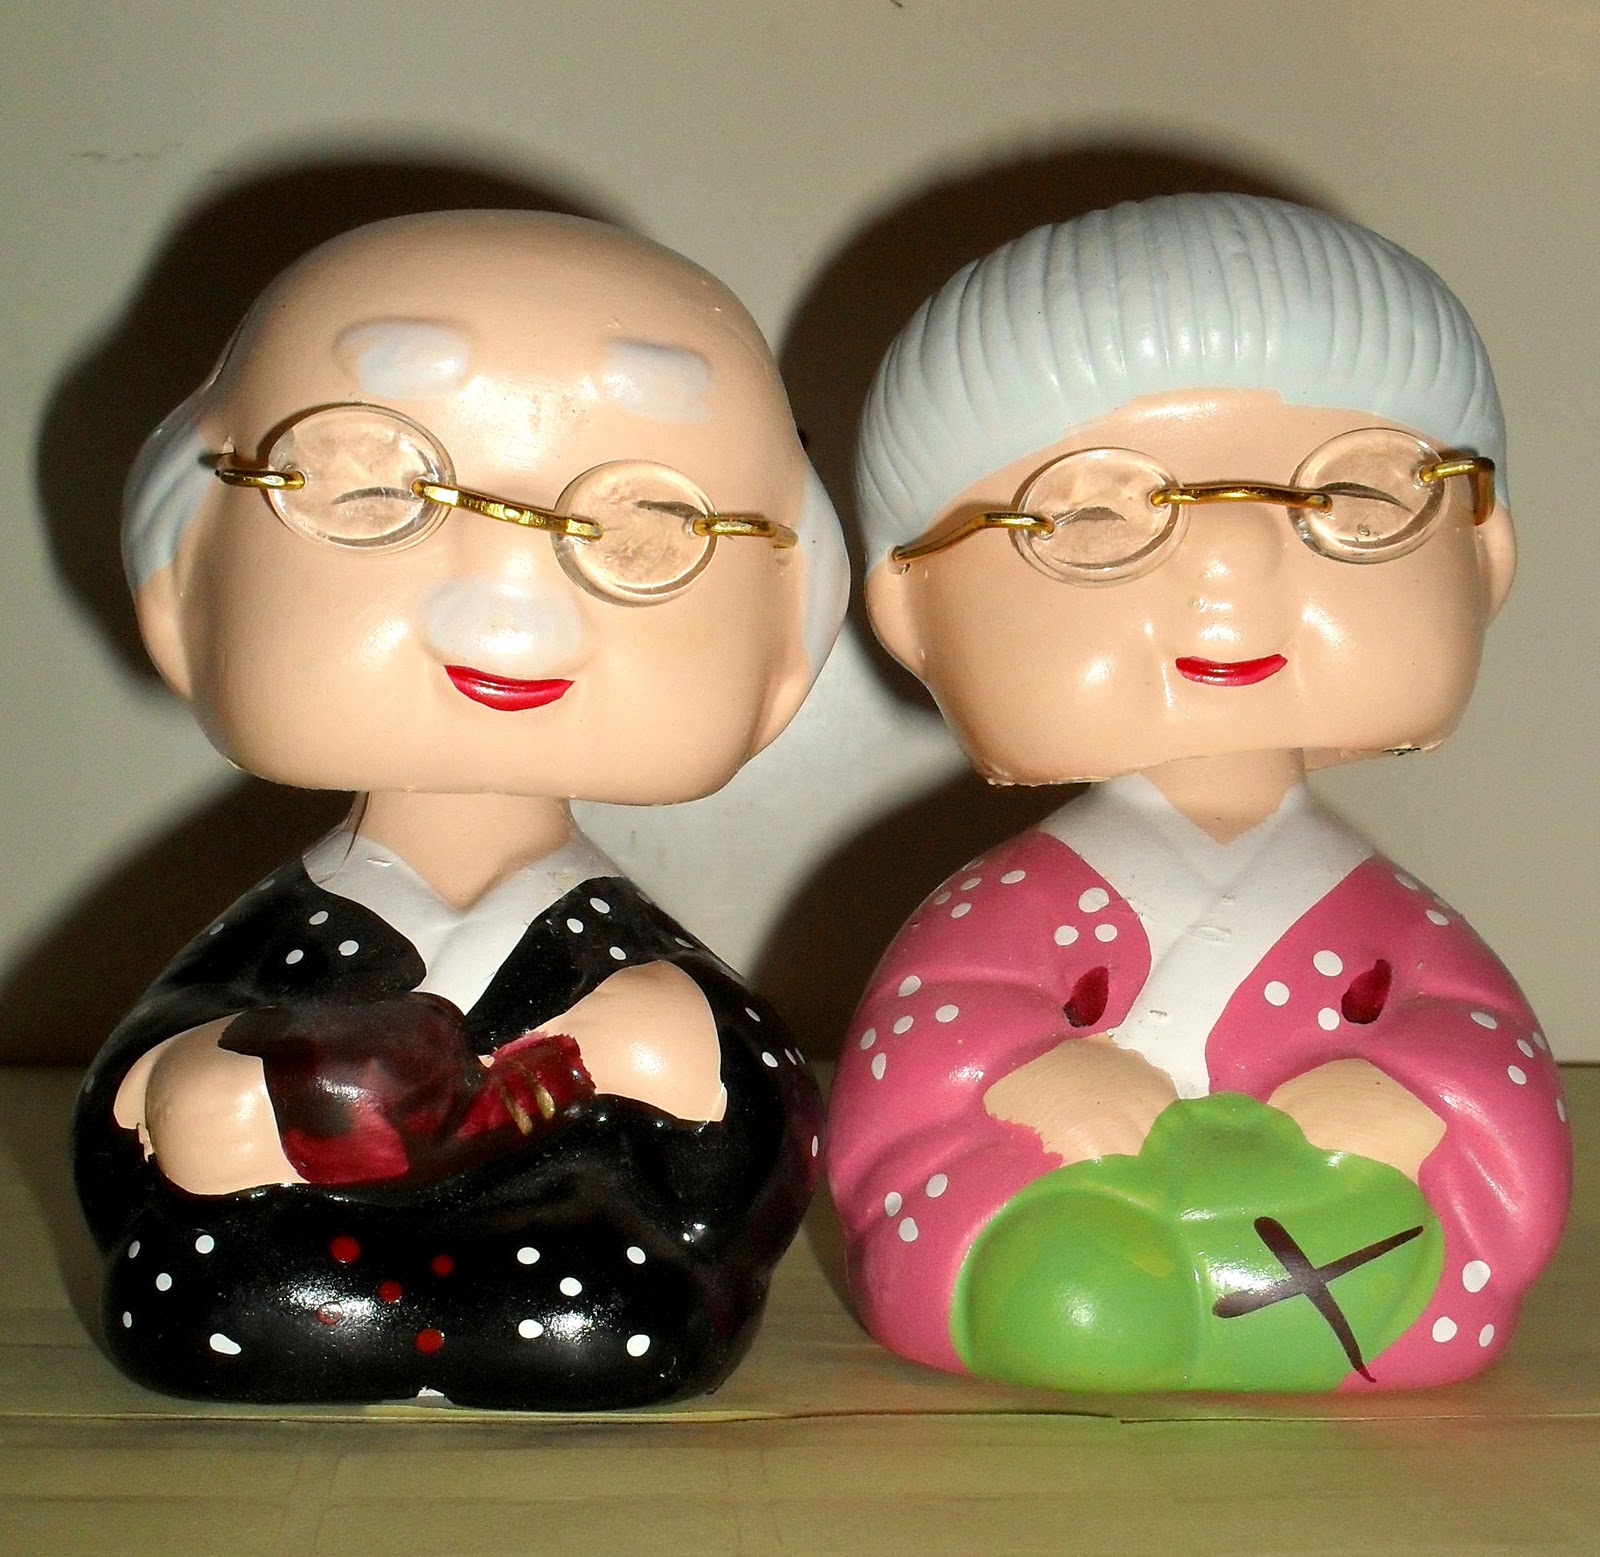 Humor Cerita Lucu Nenek Sayang Cucu